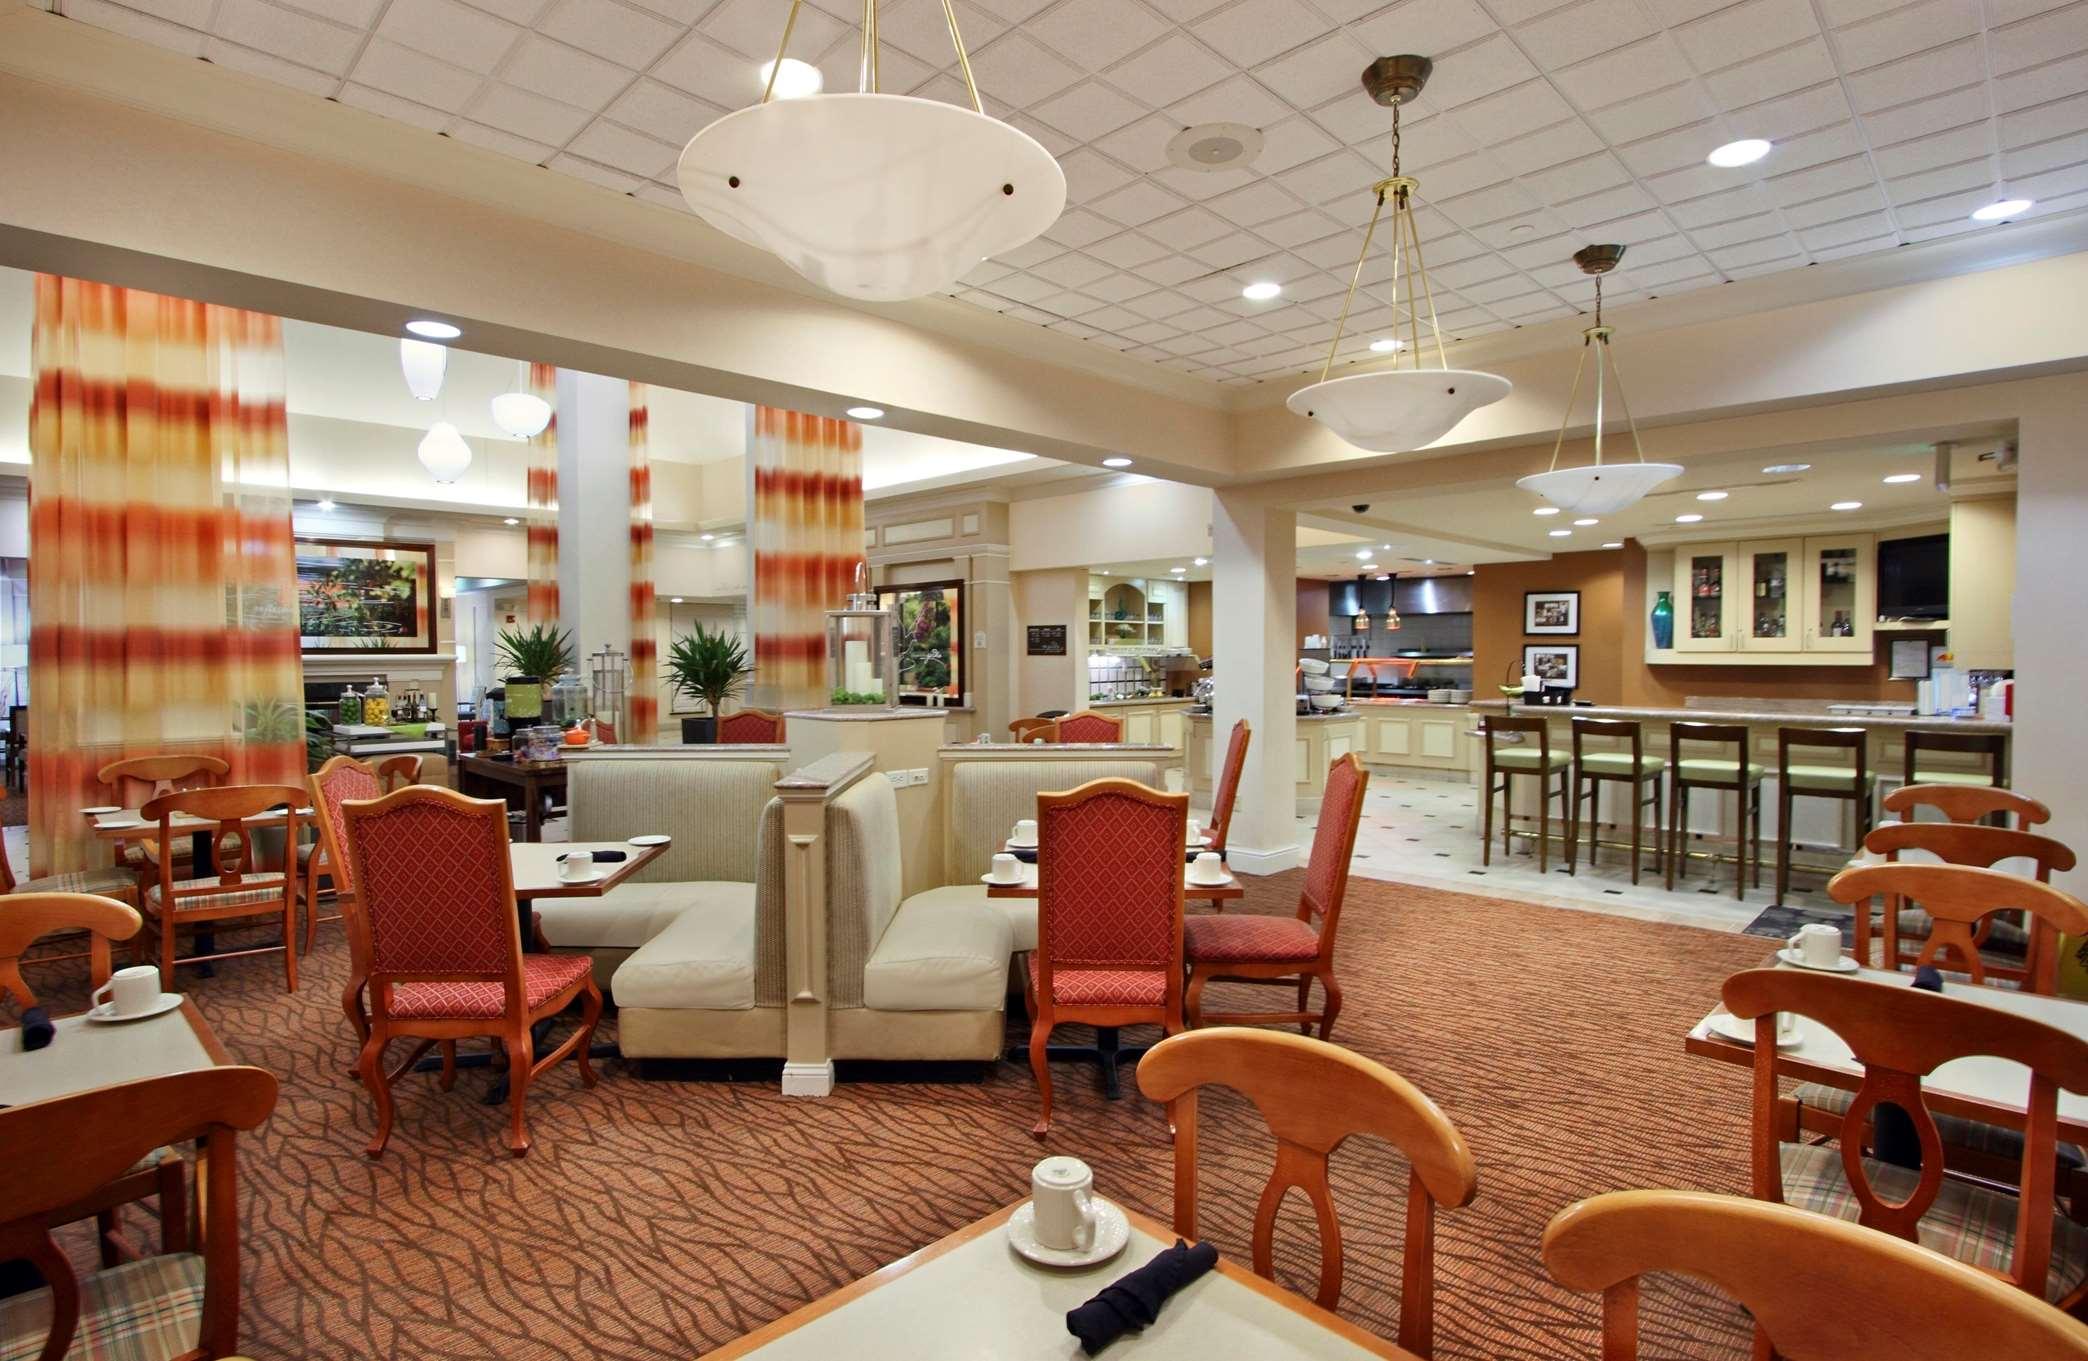 Hilton Garden Inn Chesapeake Greenbrier In Chesapeake Va 23320